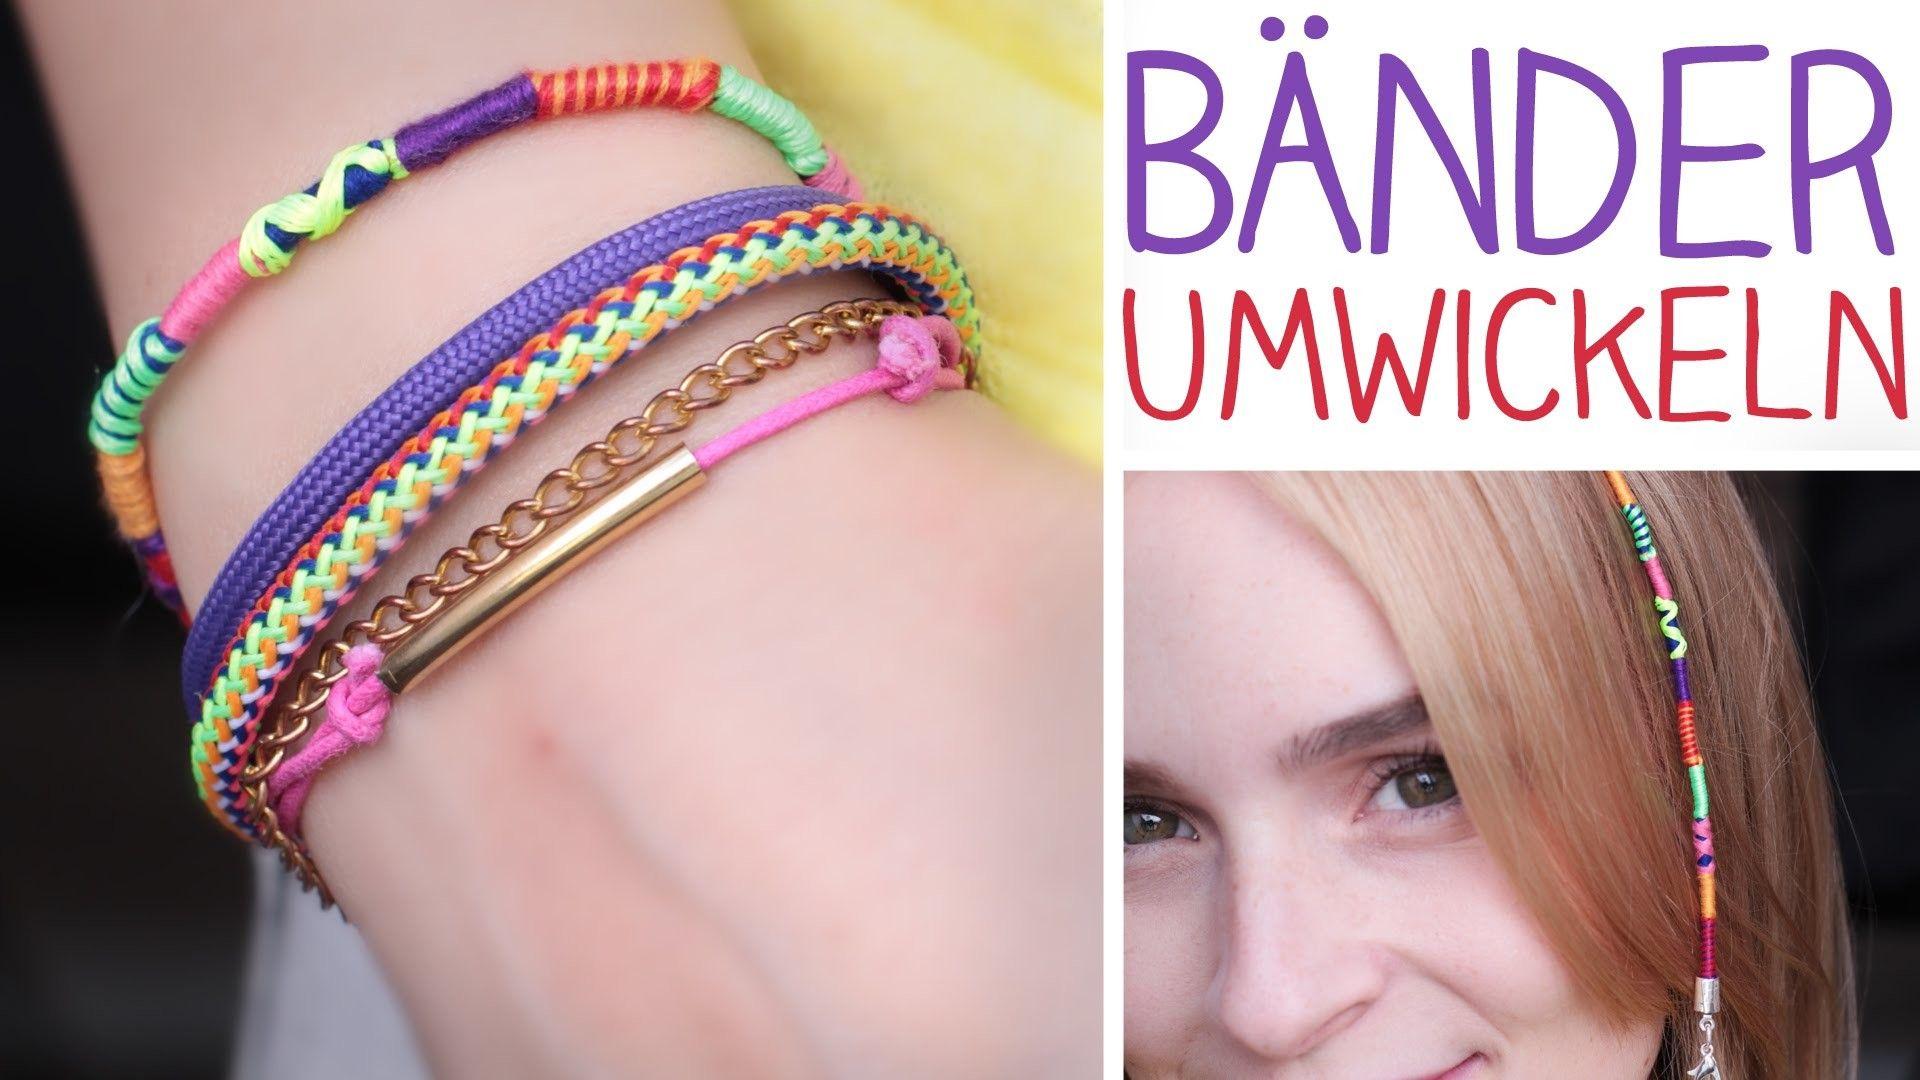 Diy Bander Umwickeln Armband Haarwickel 3 Muster Hairwrap Umwickeln Armbander Knupfen Armband